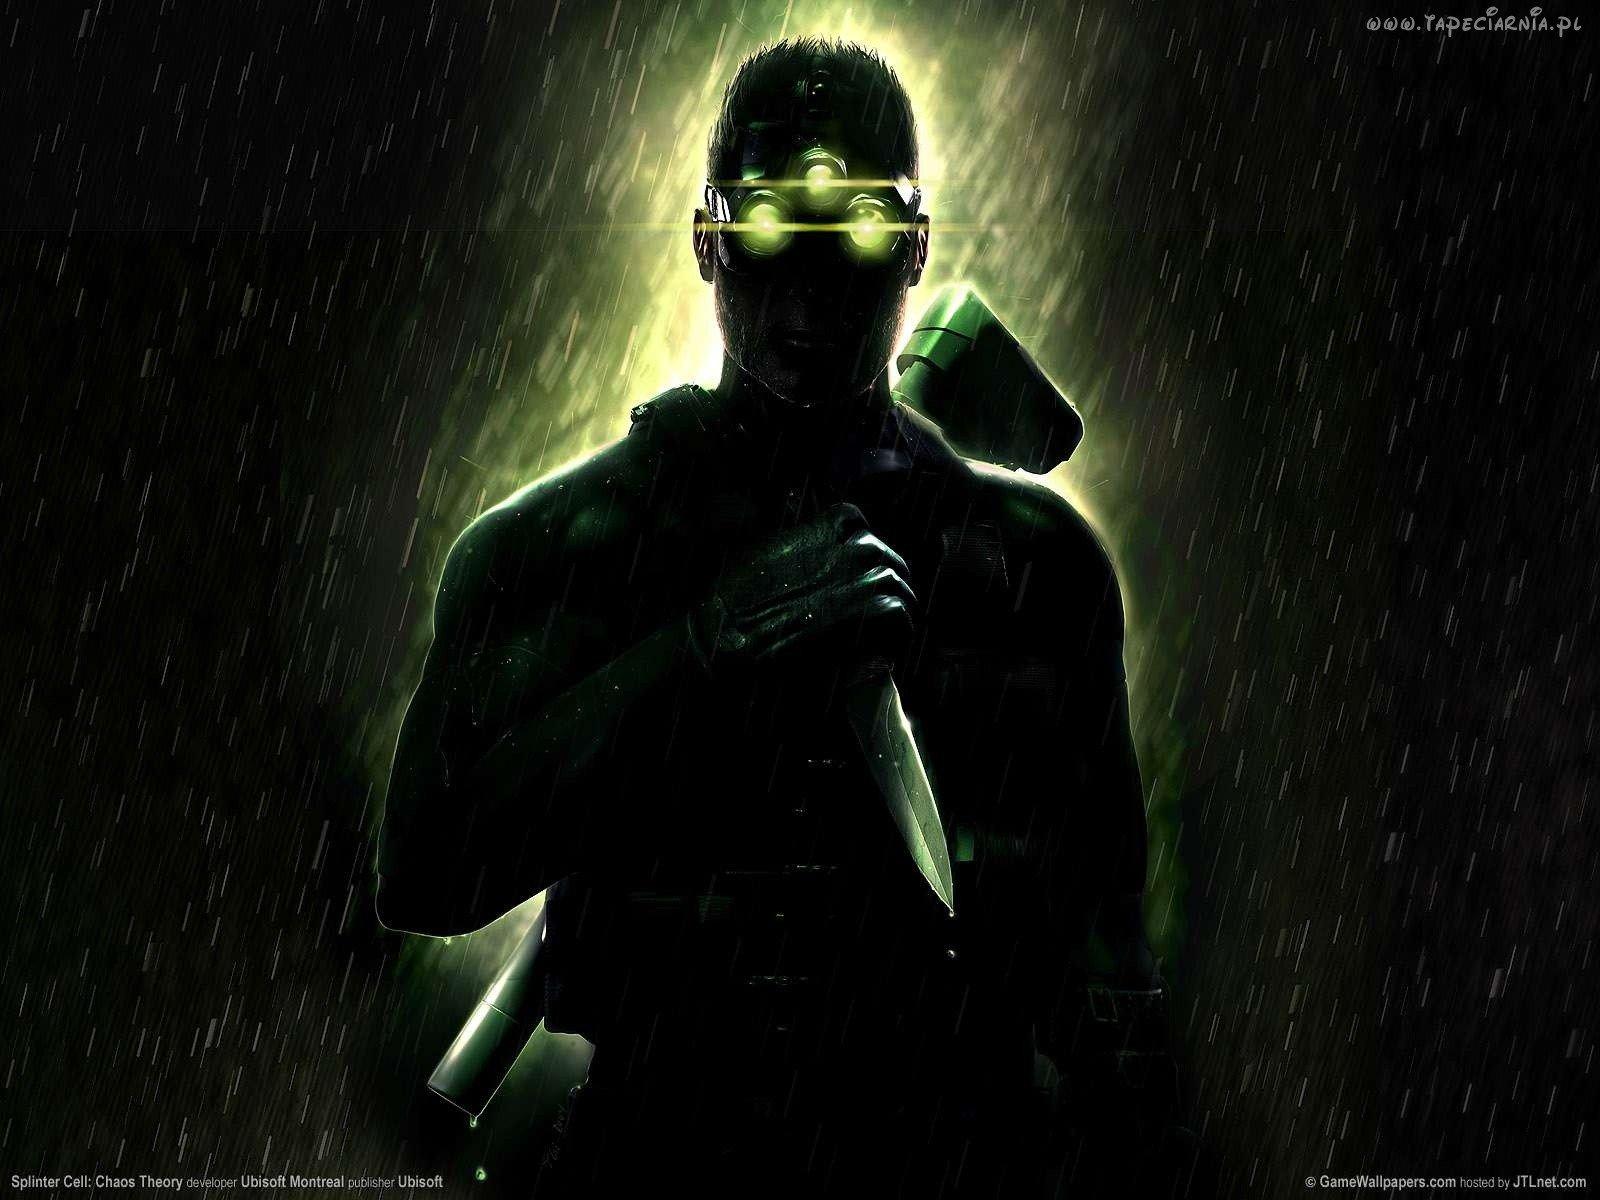 Эфир Tom Clancy's Splinter Cell Chaos Theory - Запись от 24.07.2012.